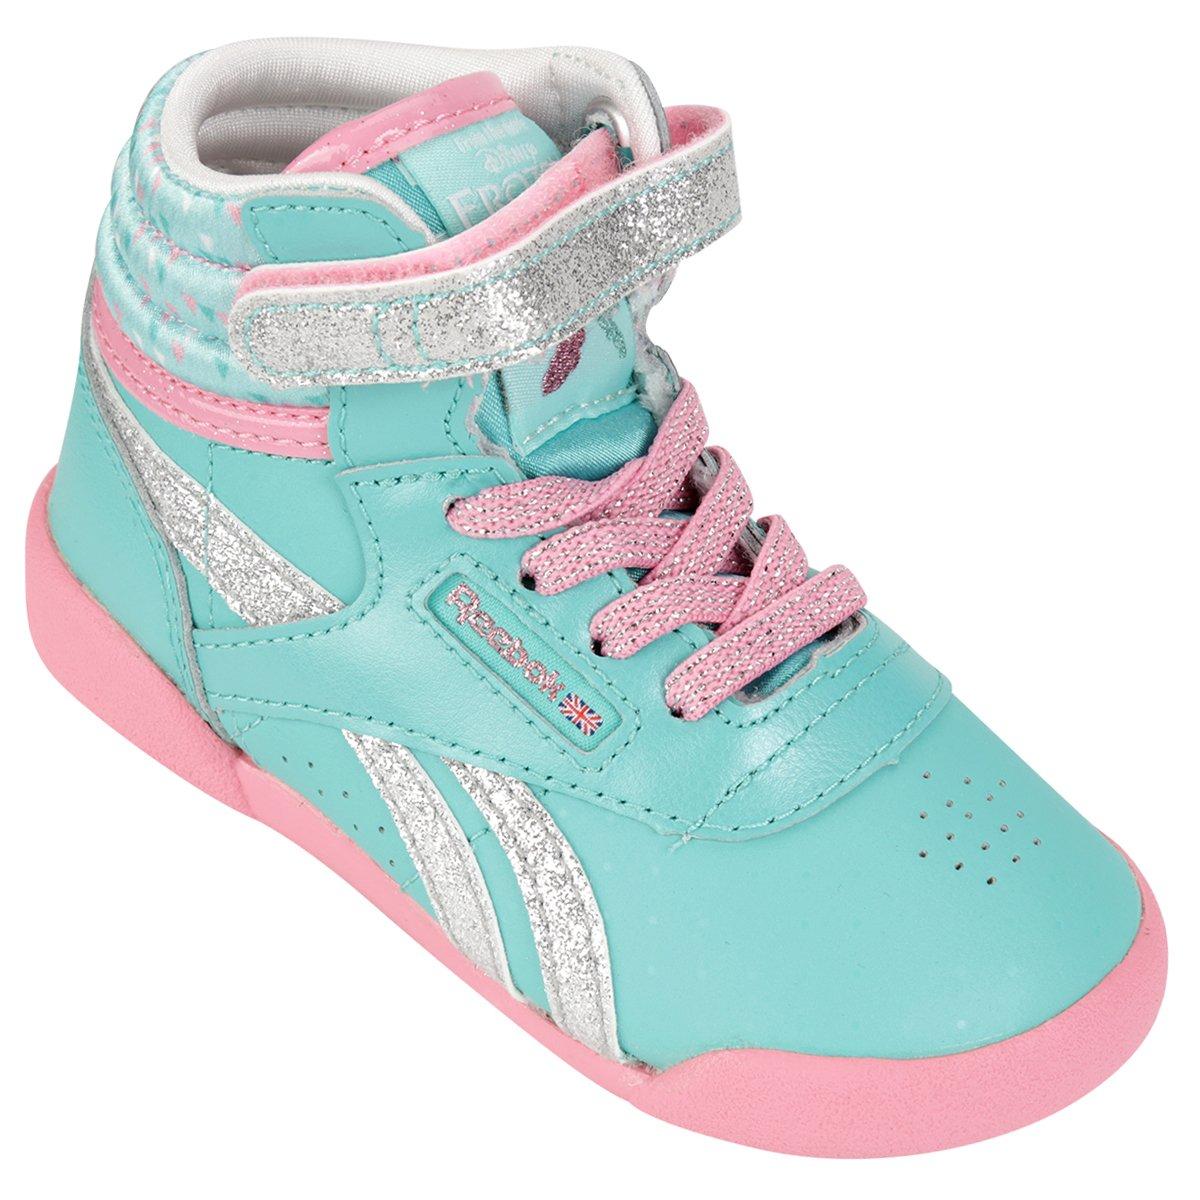 740b699720 Tênis Reebok Frozen F/S Hi Infantil - Compre Agora   Netshoes